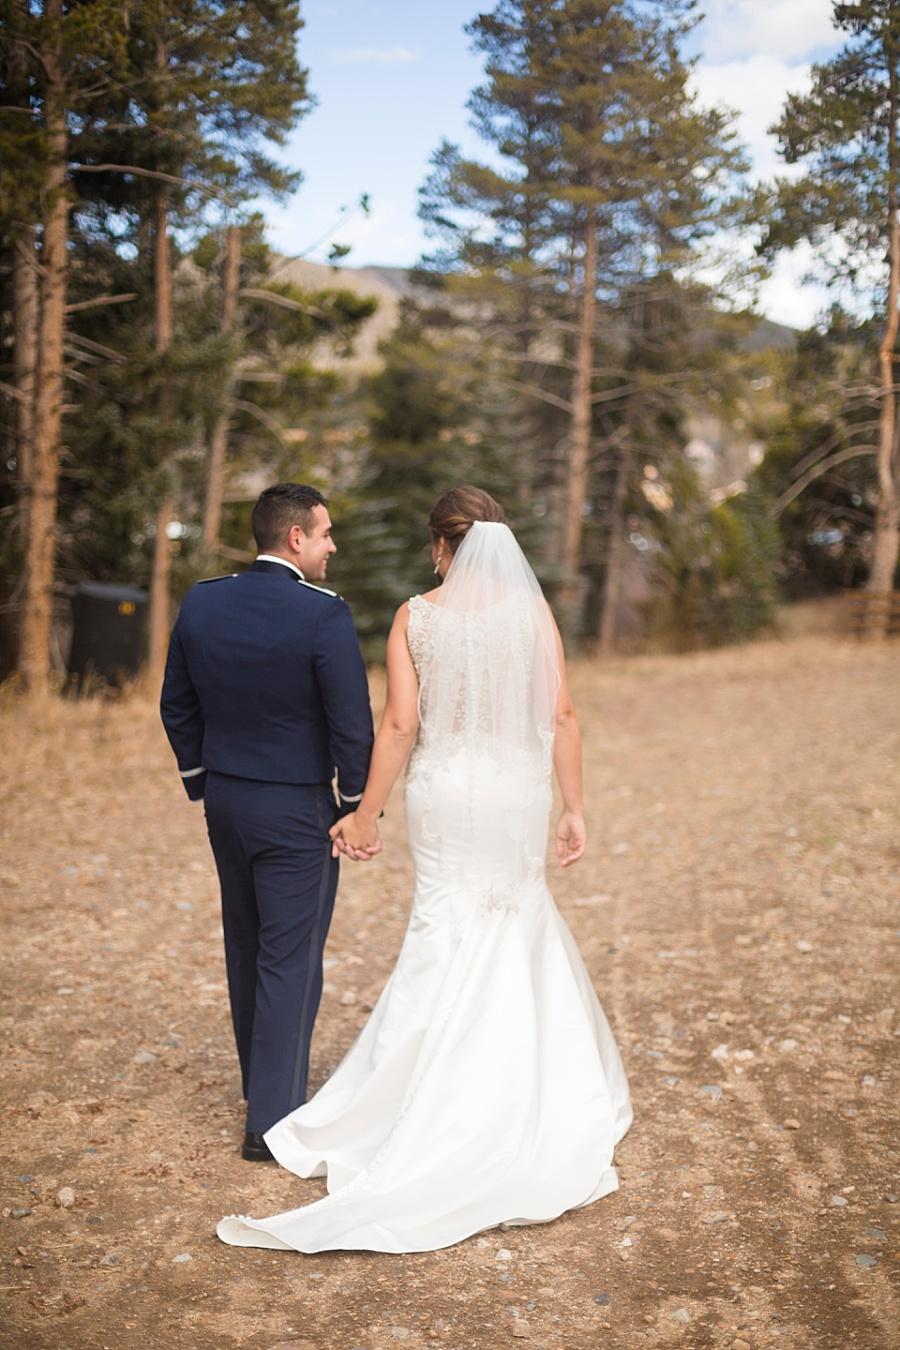 Stacy Anderson Photography Breckenridge Denver Boulder Vail Colorado Travel Lifestyle Elopement Vow renewal Family Wedding Photographer_0018.jpg